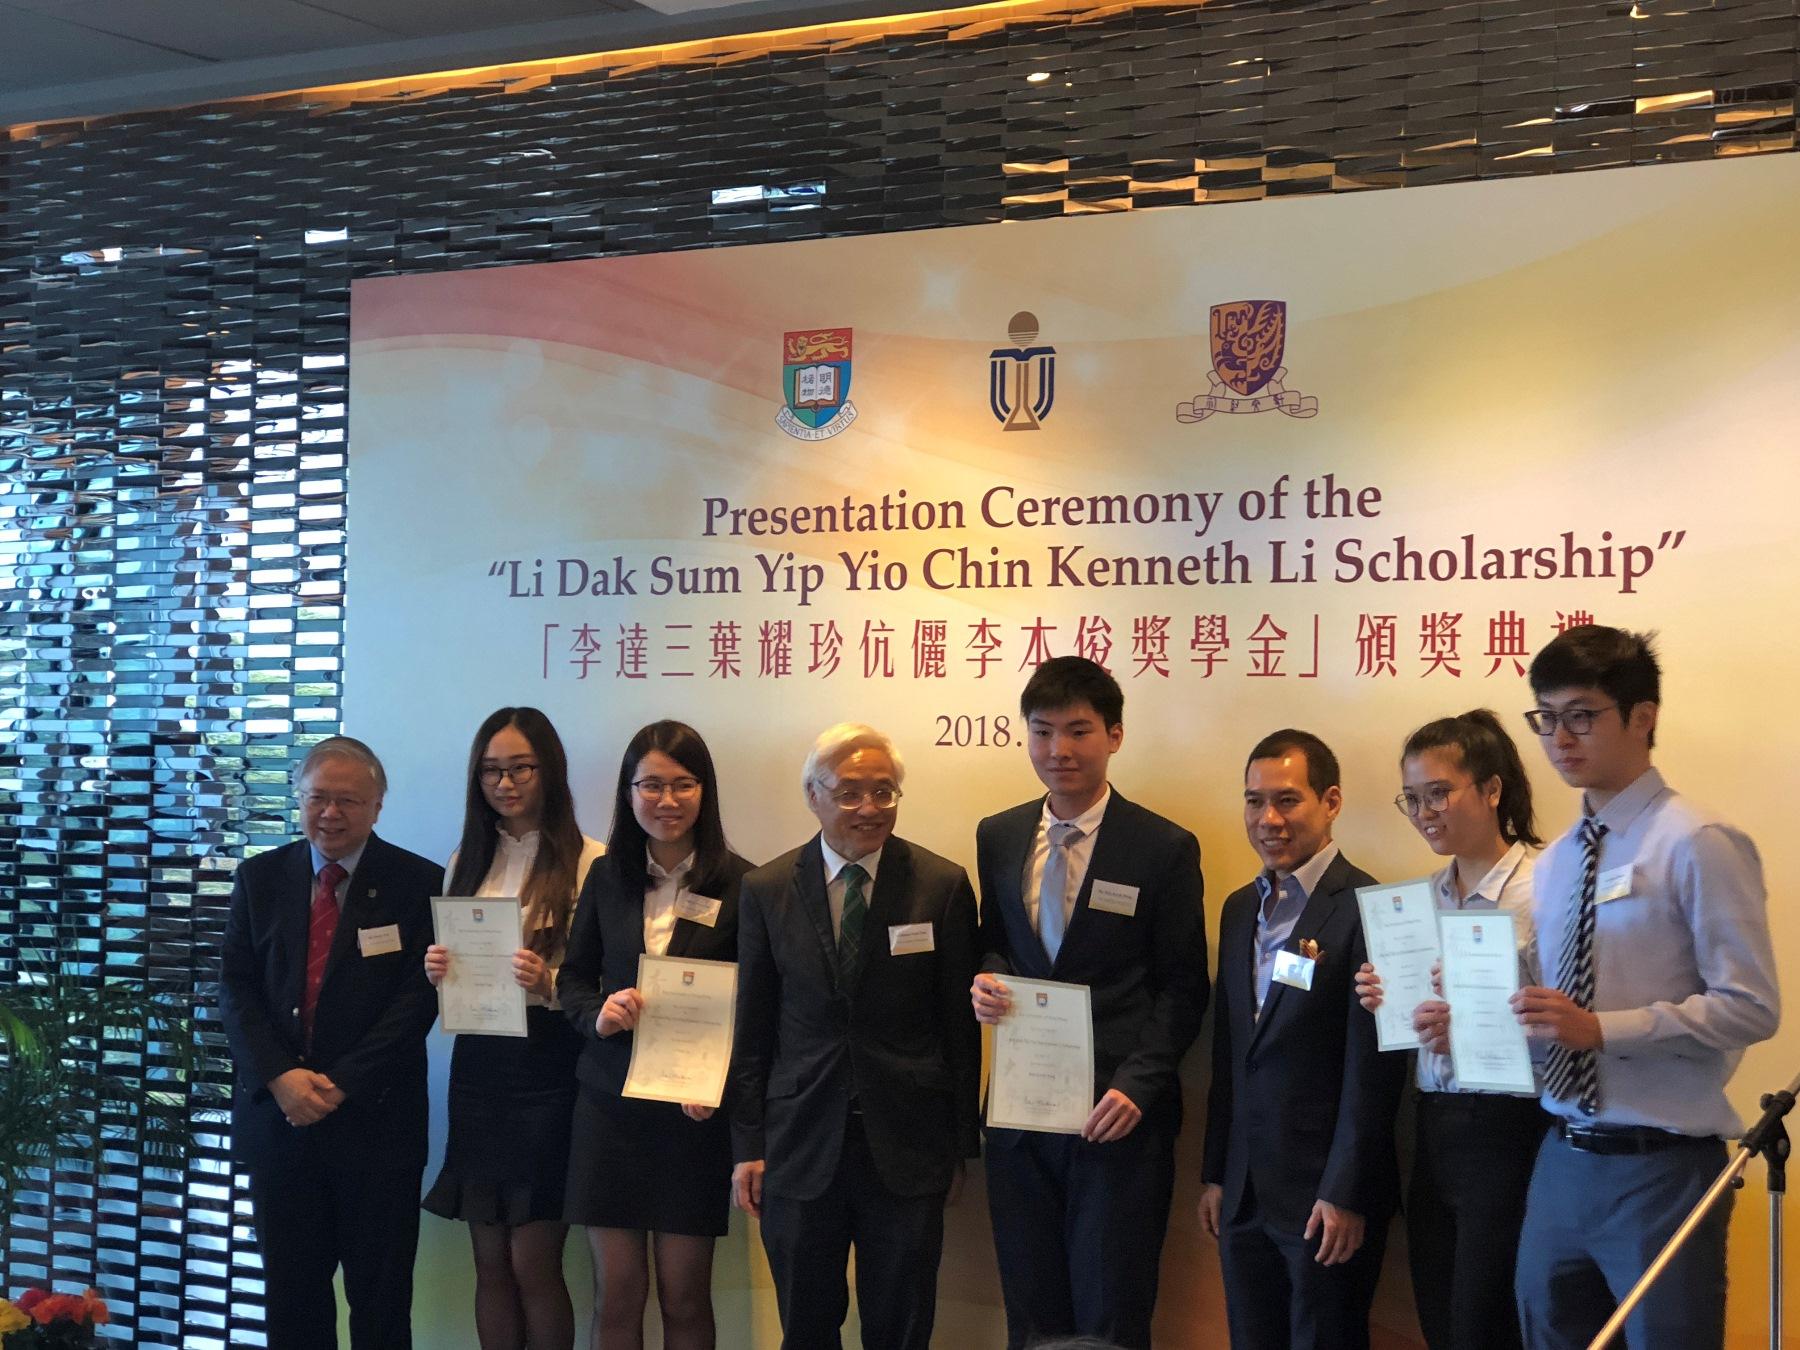 http://npc.edu.hk/sites/default/files/img_0423.jpg